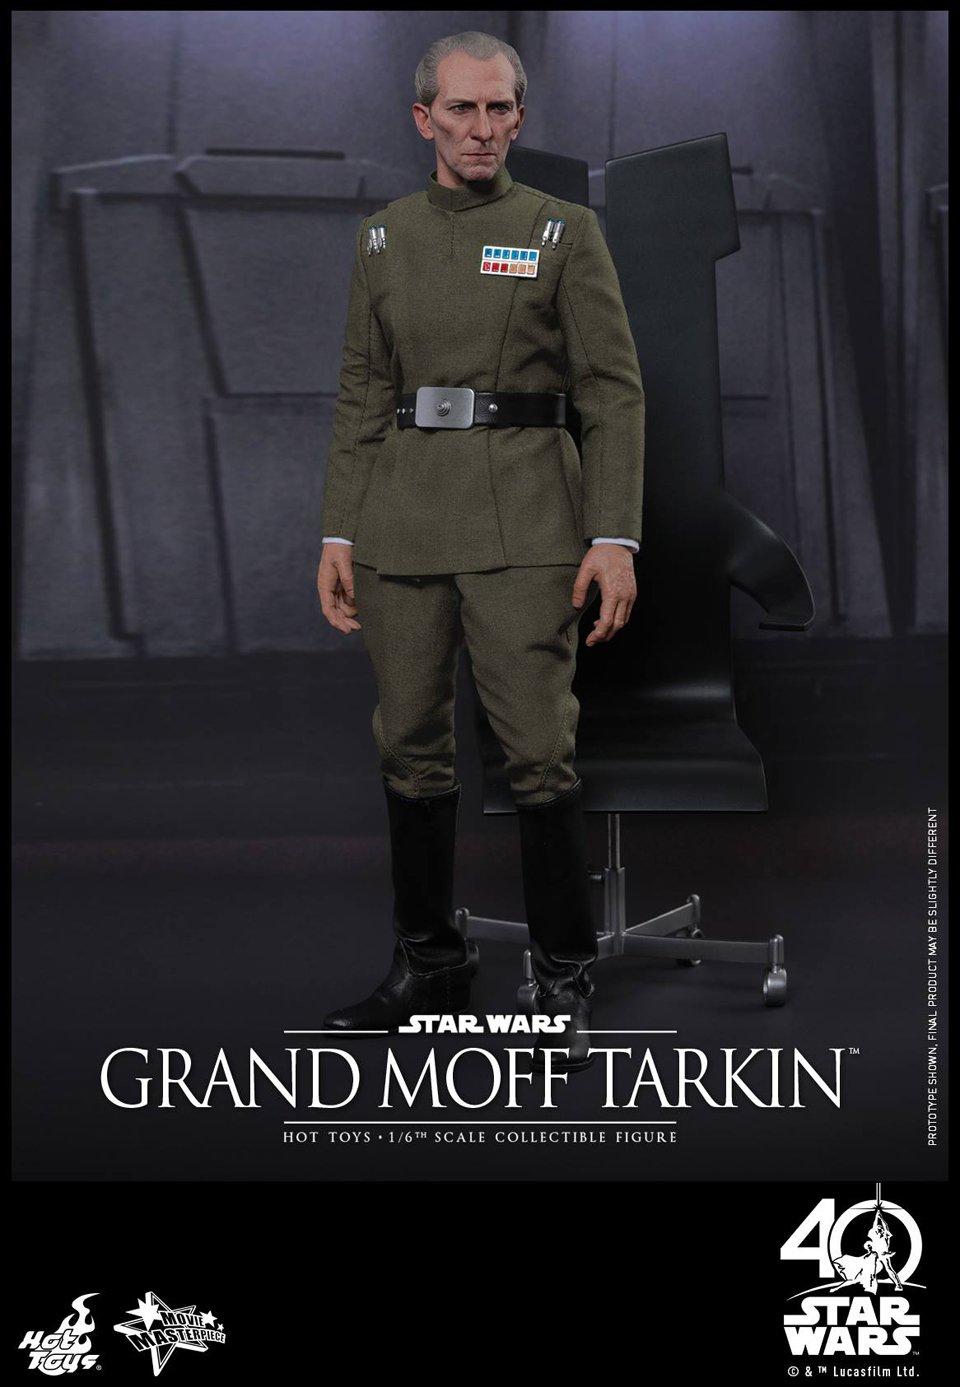 Hot Toys Star Wars Grand Moff Tarkin 1/6 Scale Action Figure